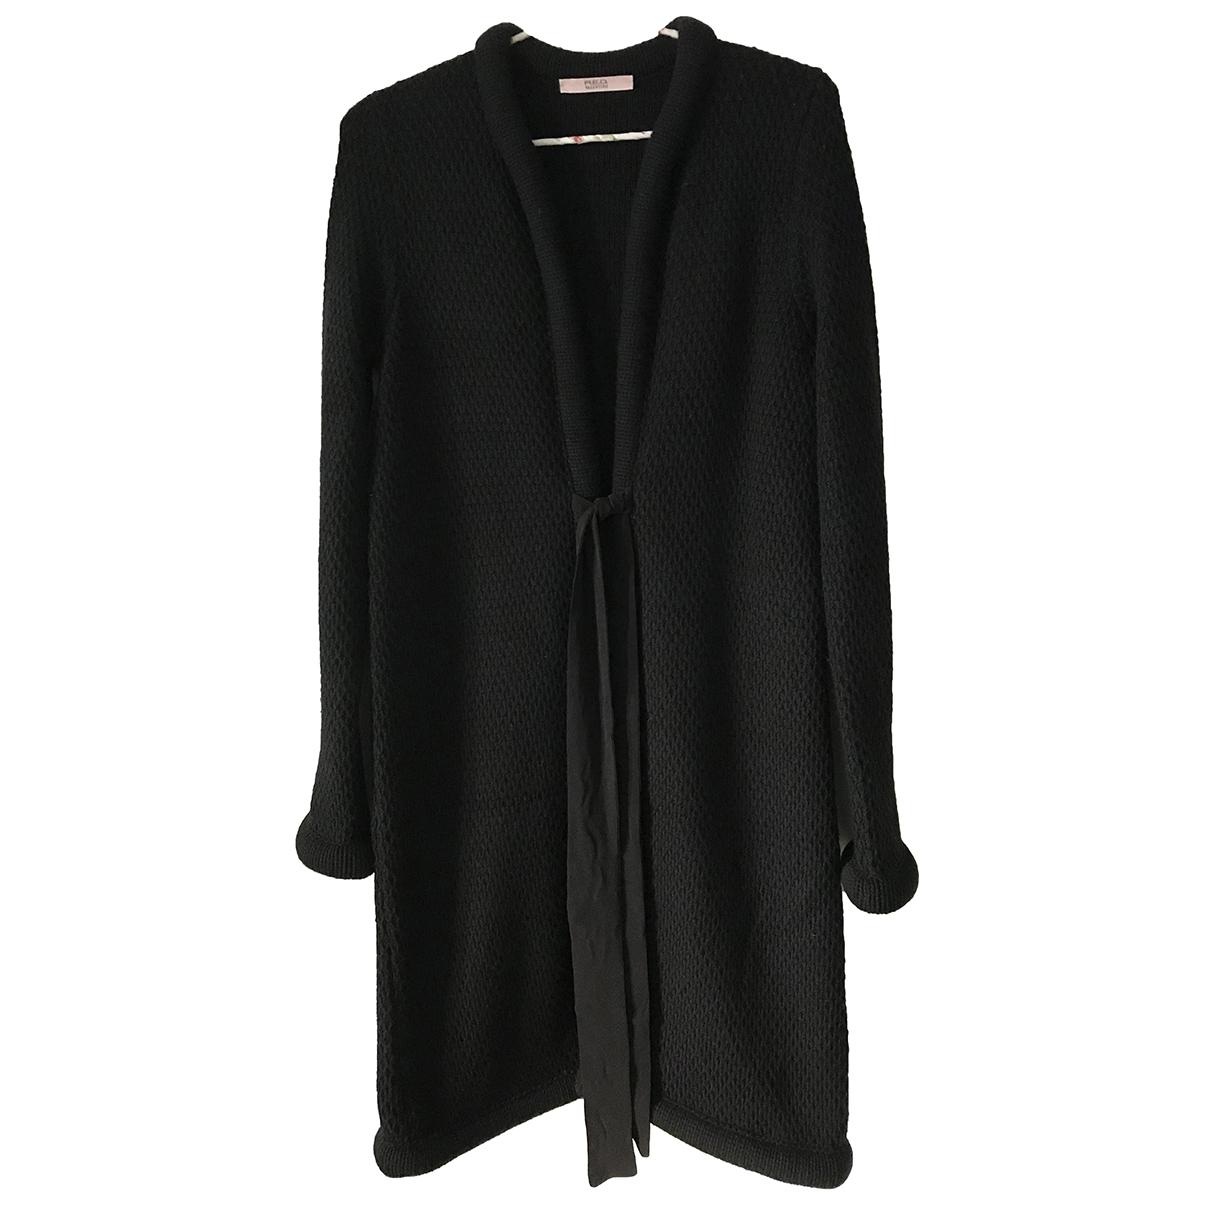 Red Valentino Garavani \N Black Wool coat for Women 40 IT